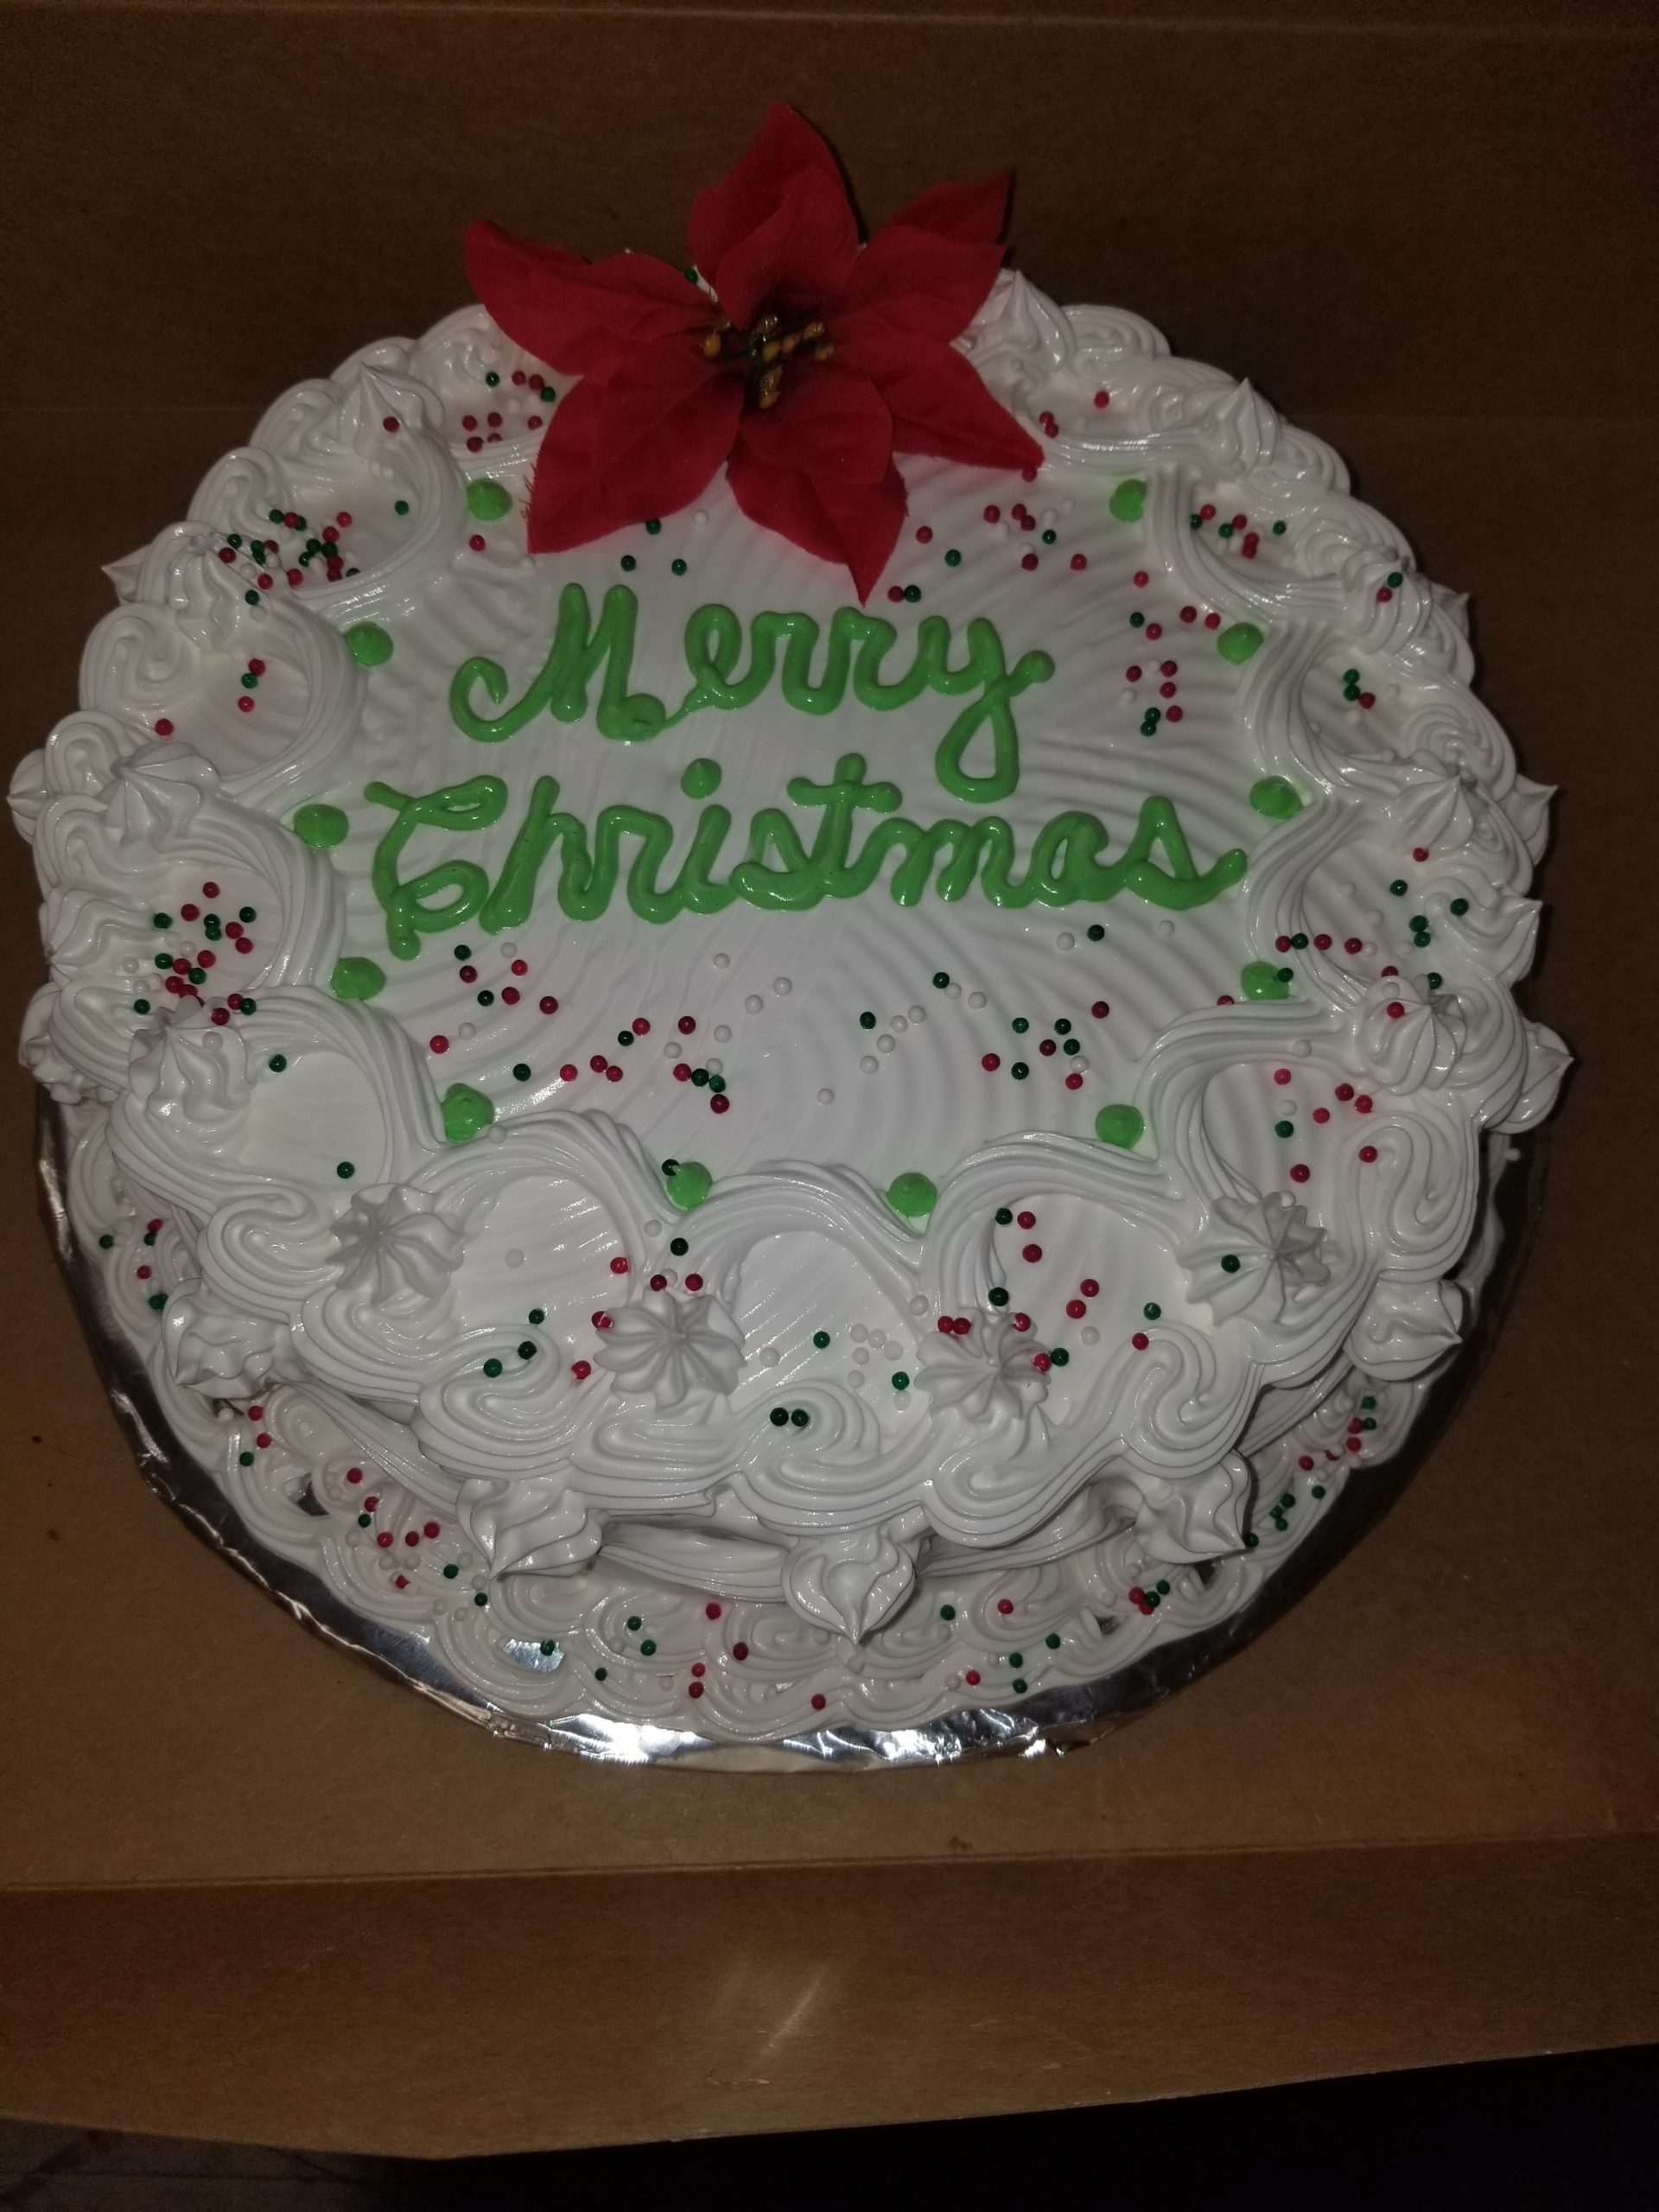 12-18-2018 Merry Christmas Cake - Marion Oaks Staff